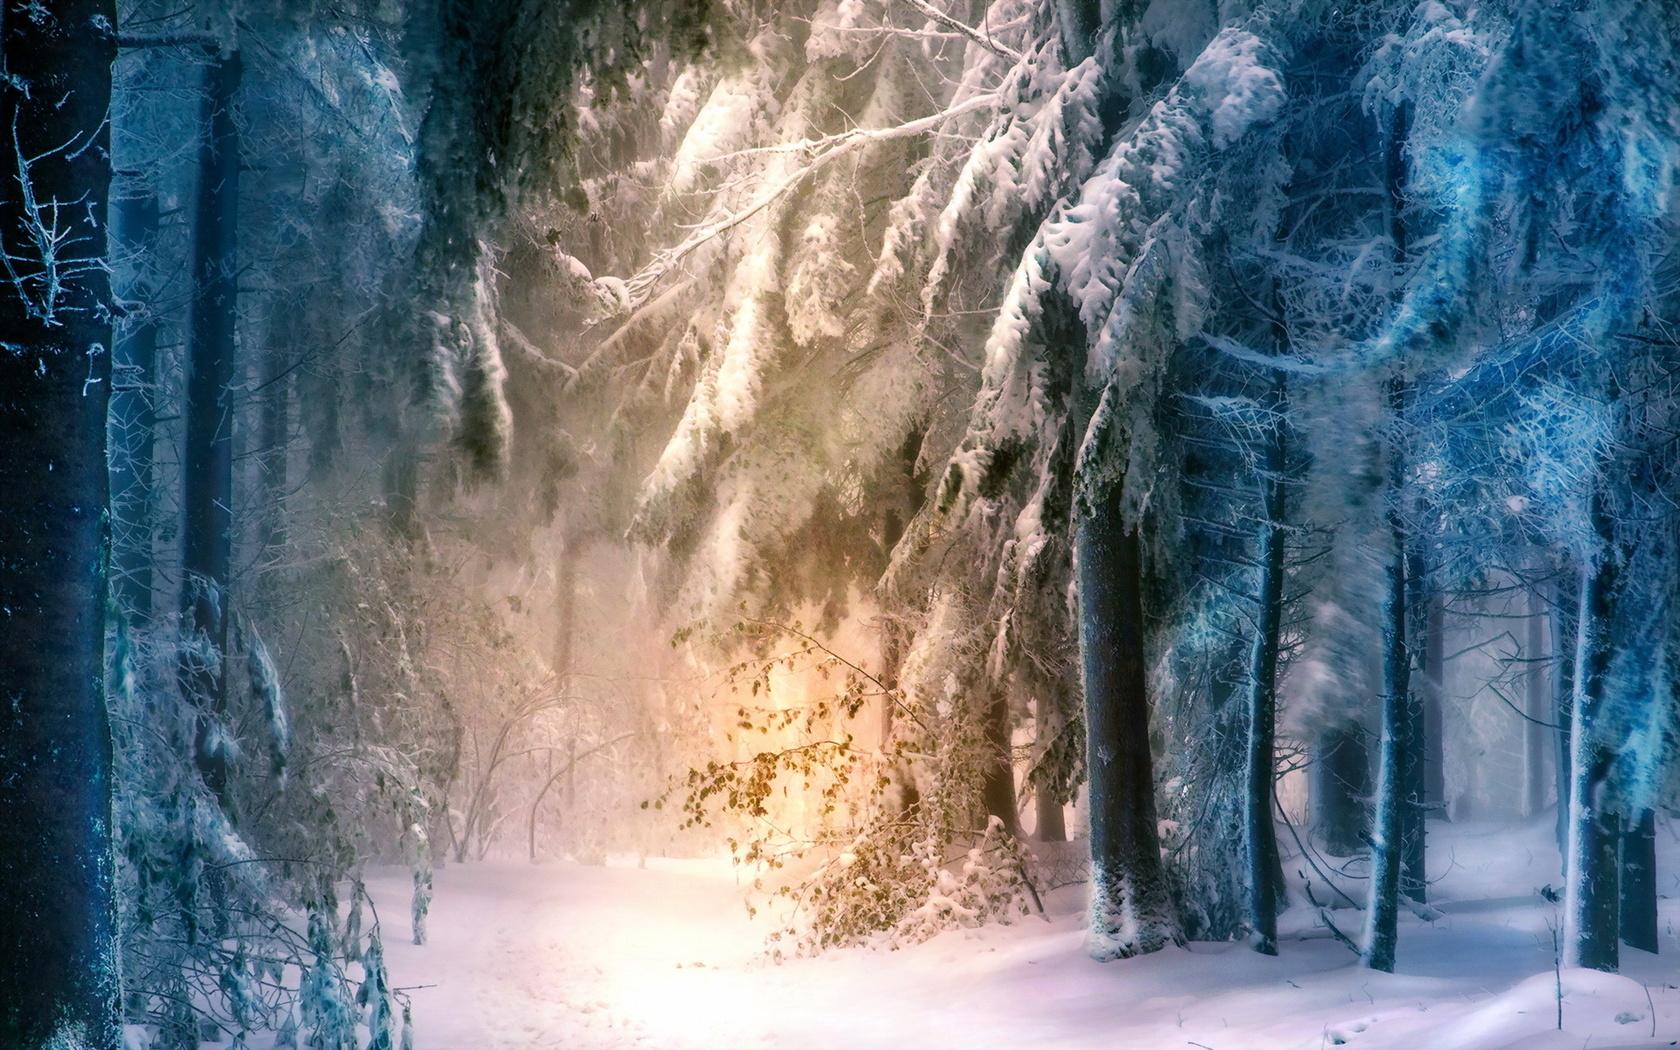 природа, зима, снег, лес, деревья, туман, свет